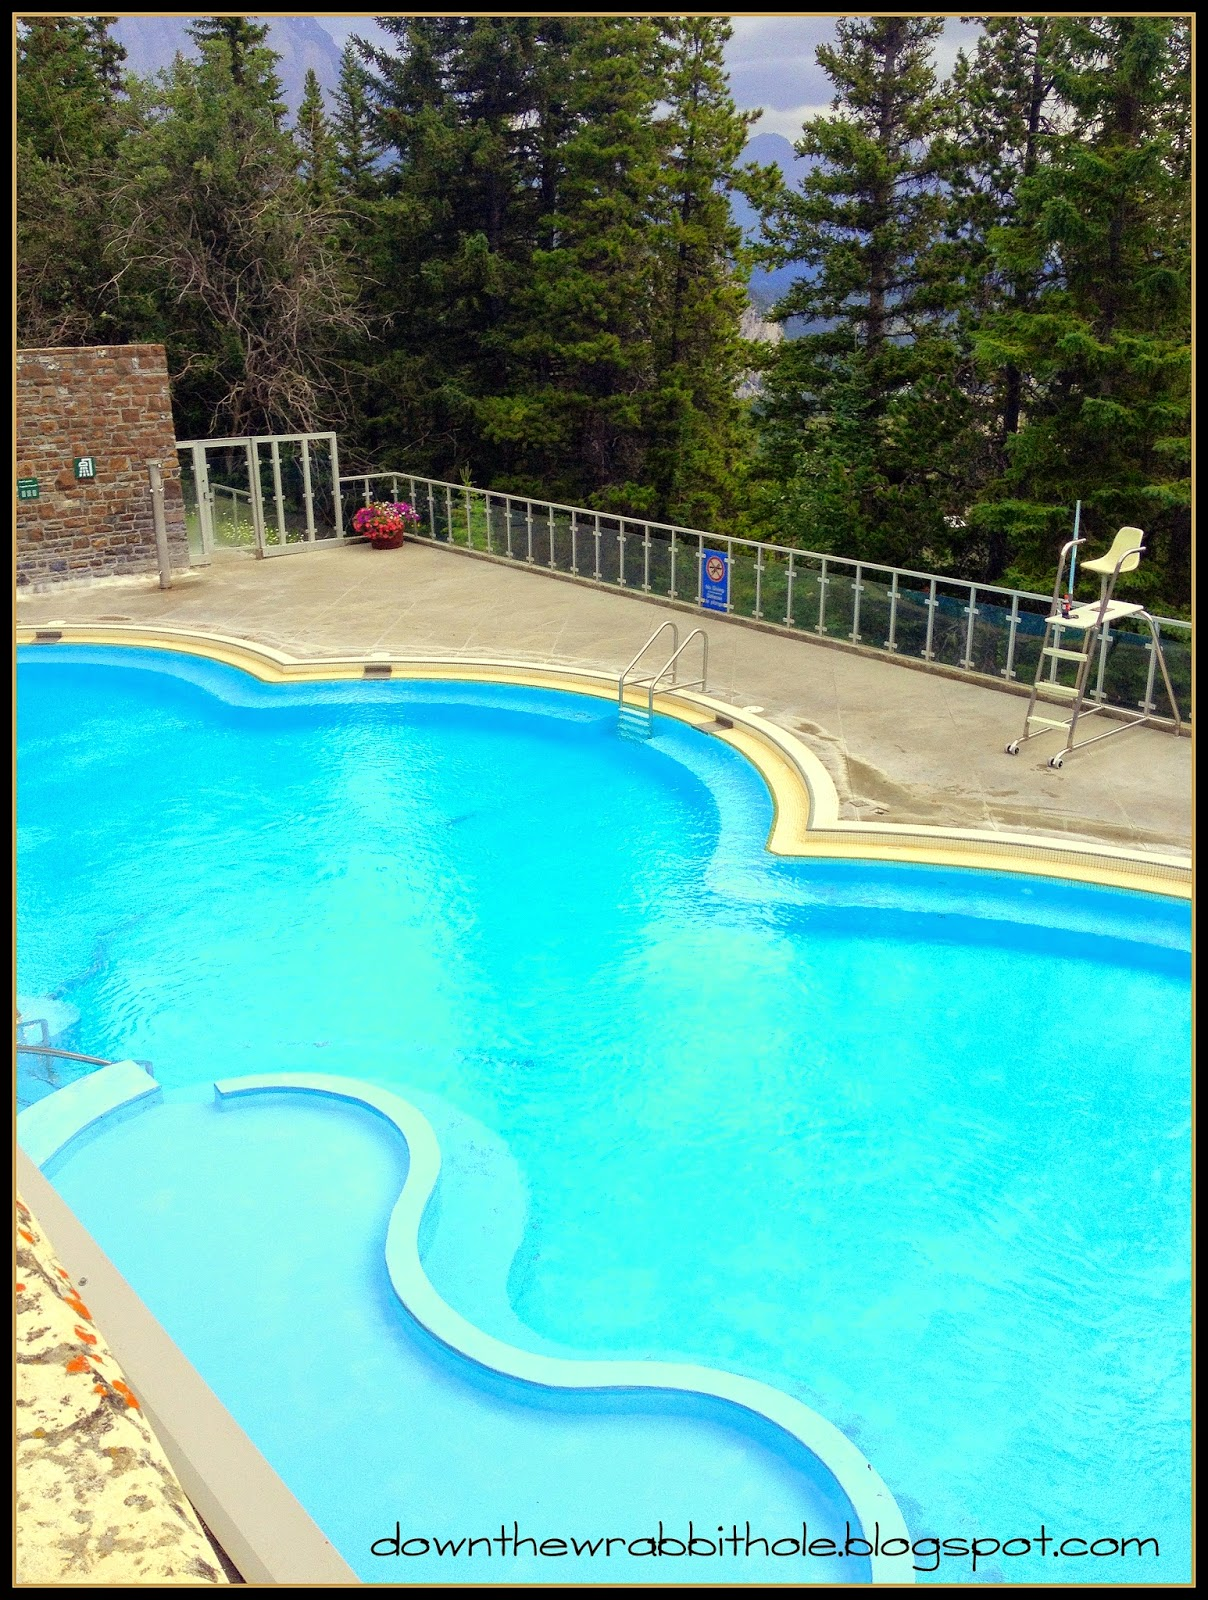 things to do in Alberta, natural hot springs Alberta, Banff tourism